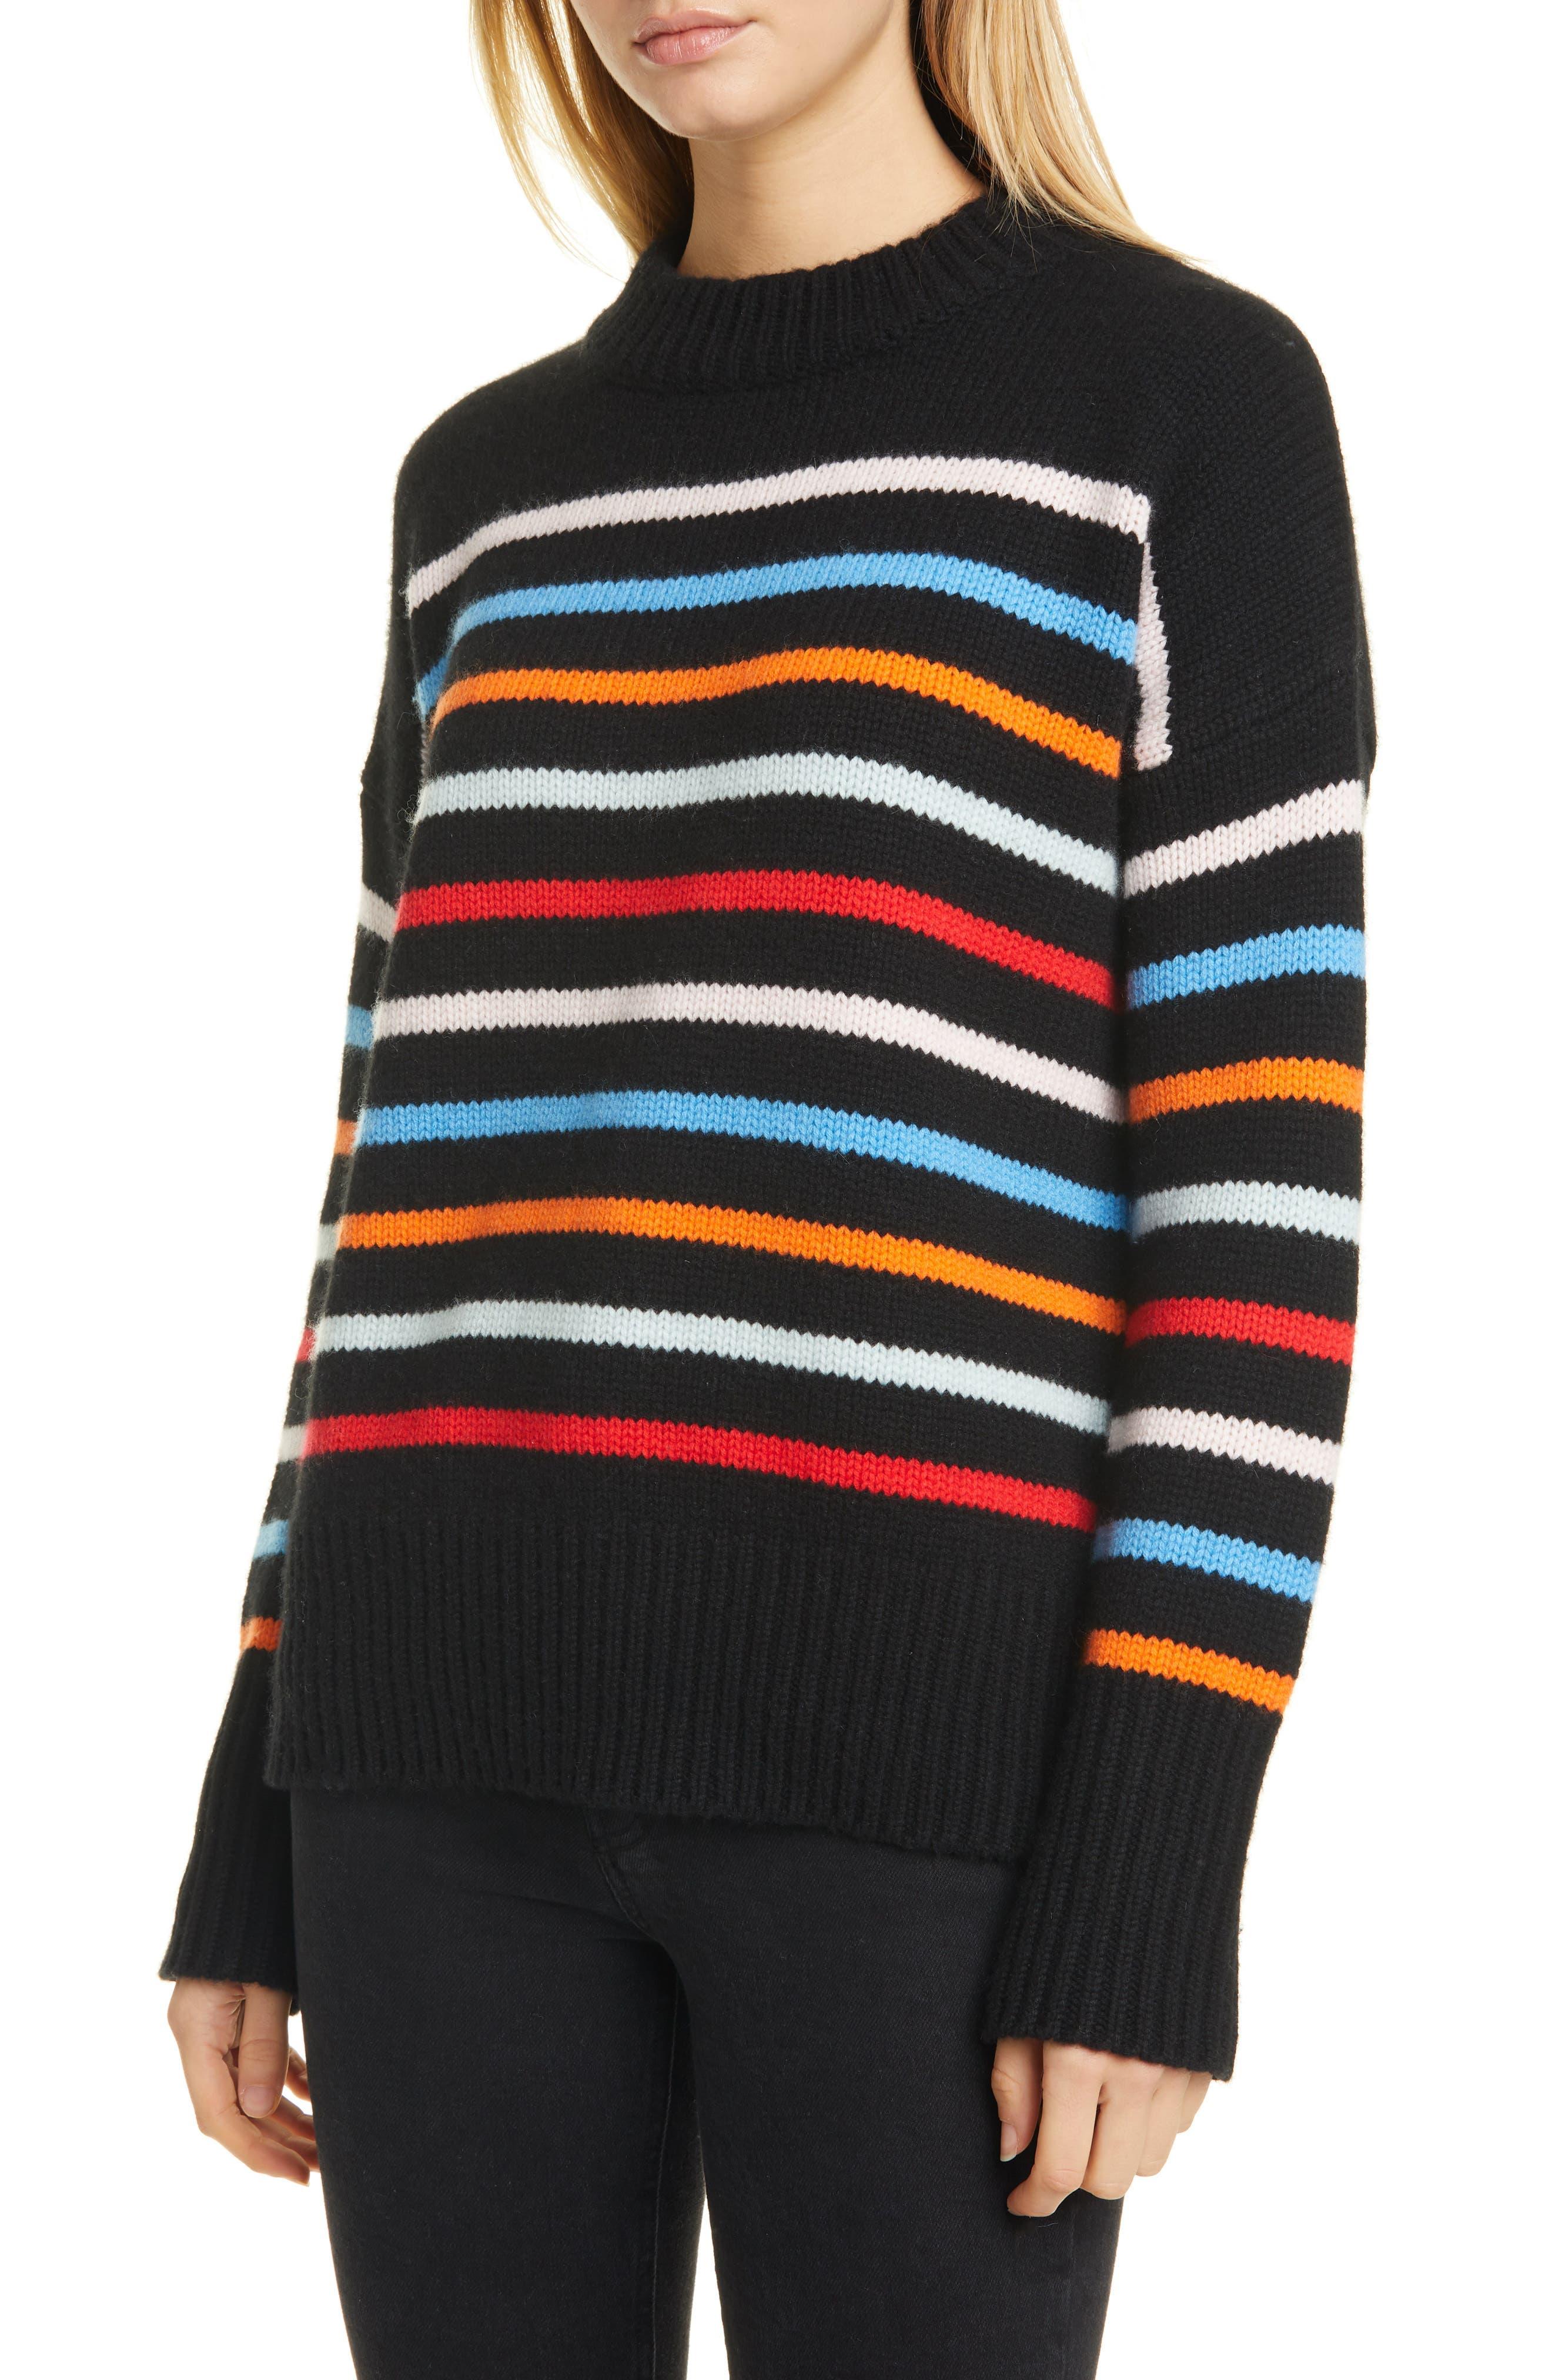 La Ligne Marin Wool & Cashmere Sweater